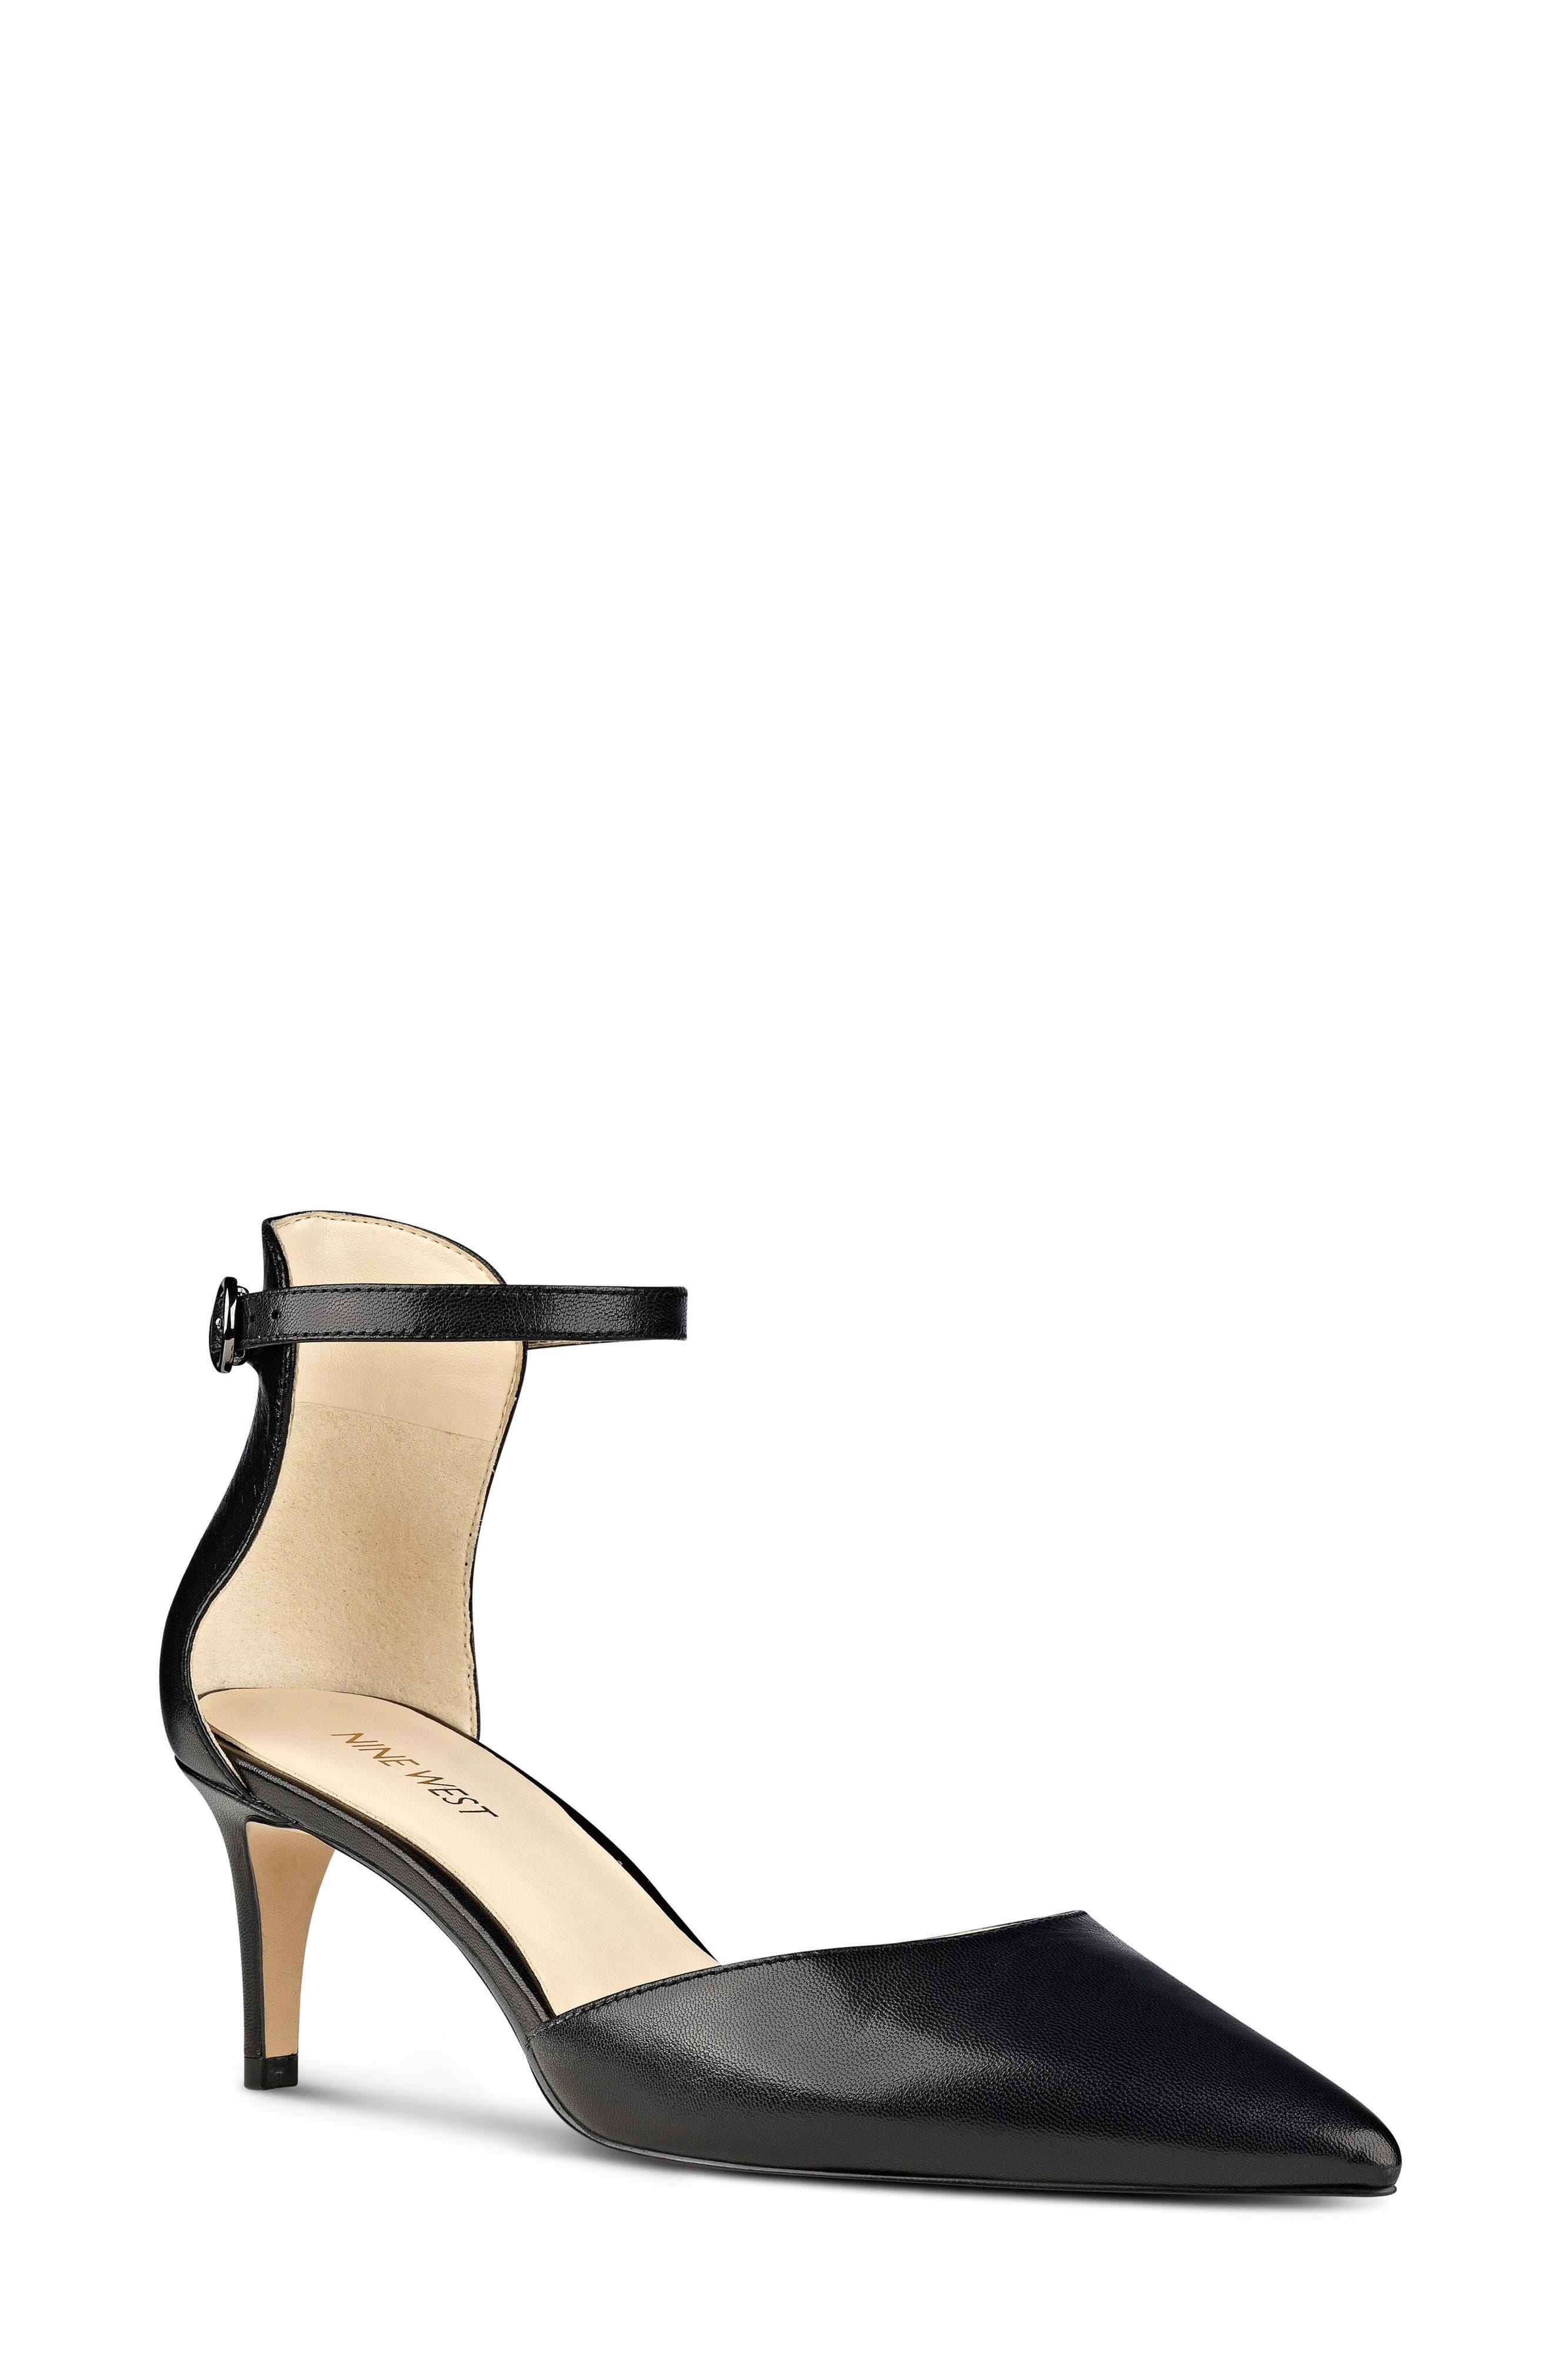 NINE WEST Sharmila Ankle Strap d'Orsay Pump, Main, color, 001